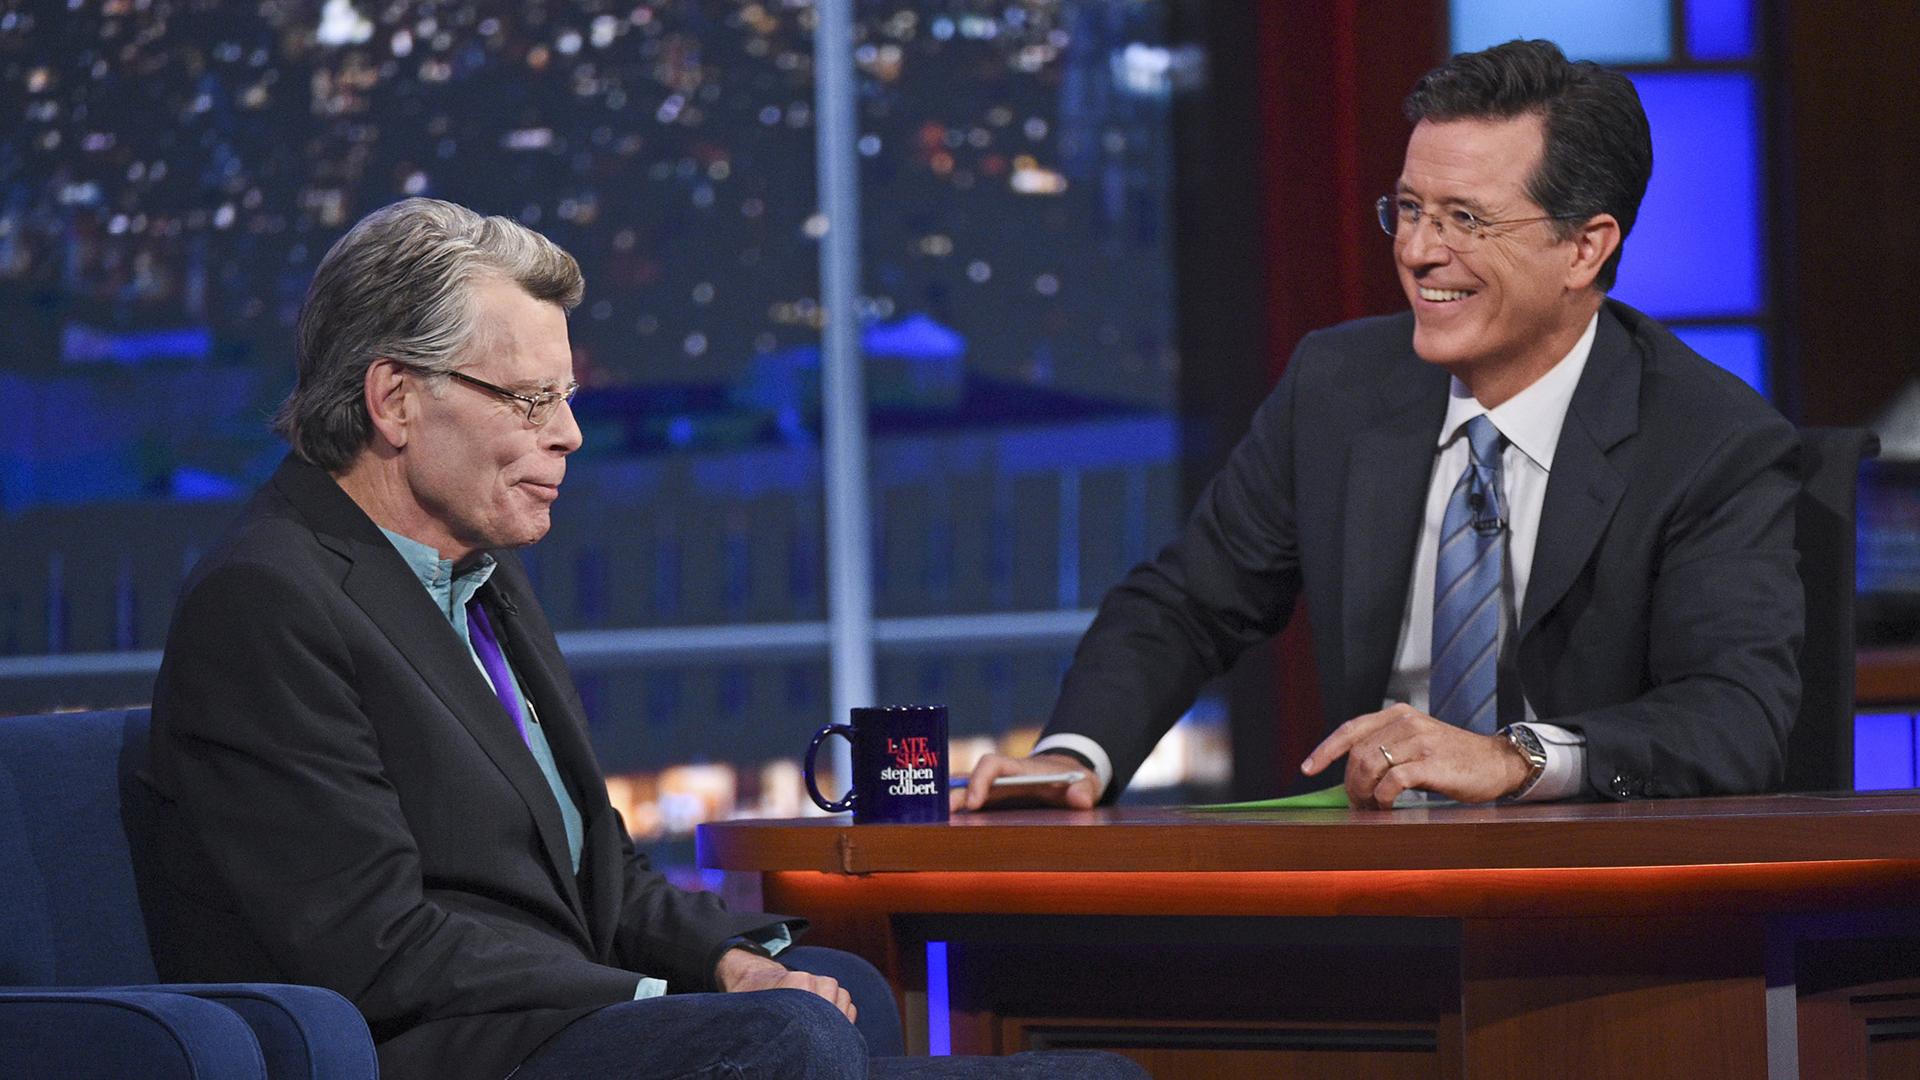 Stephen King and Stephen Colbert